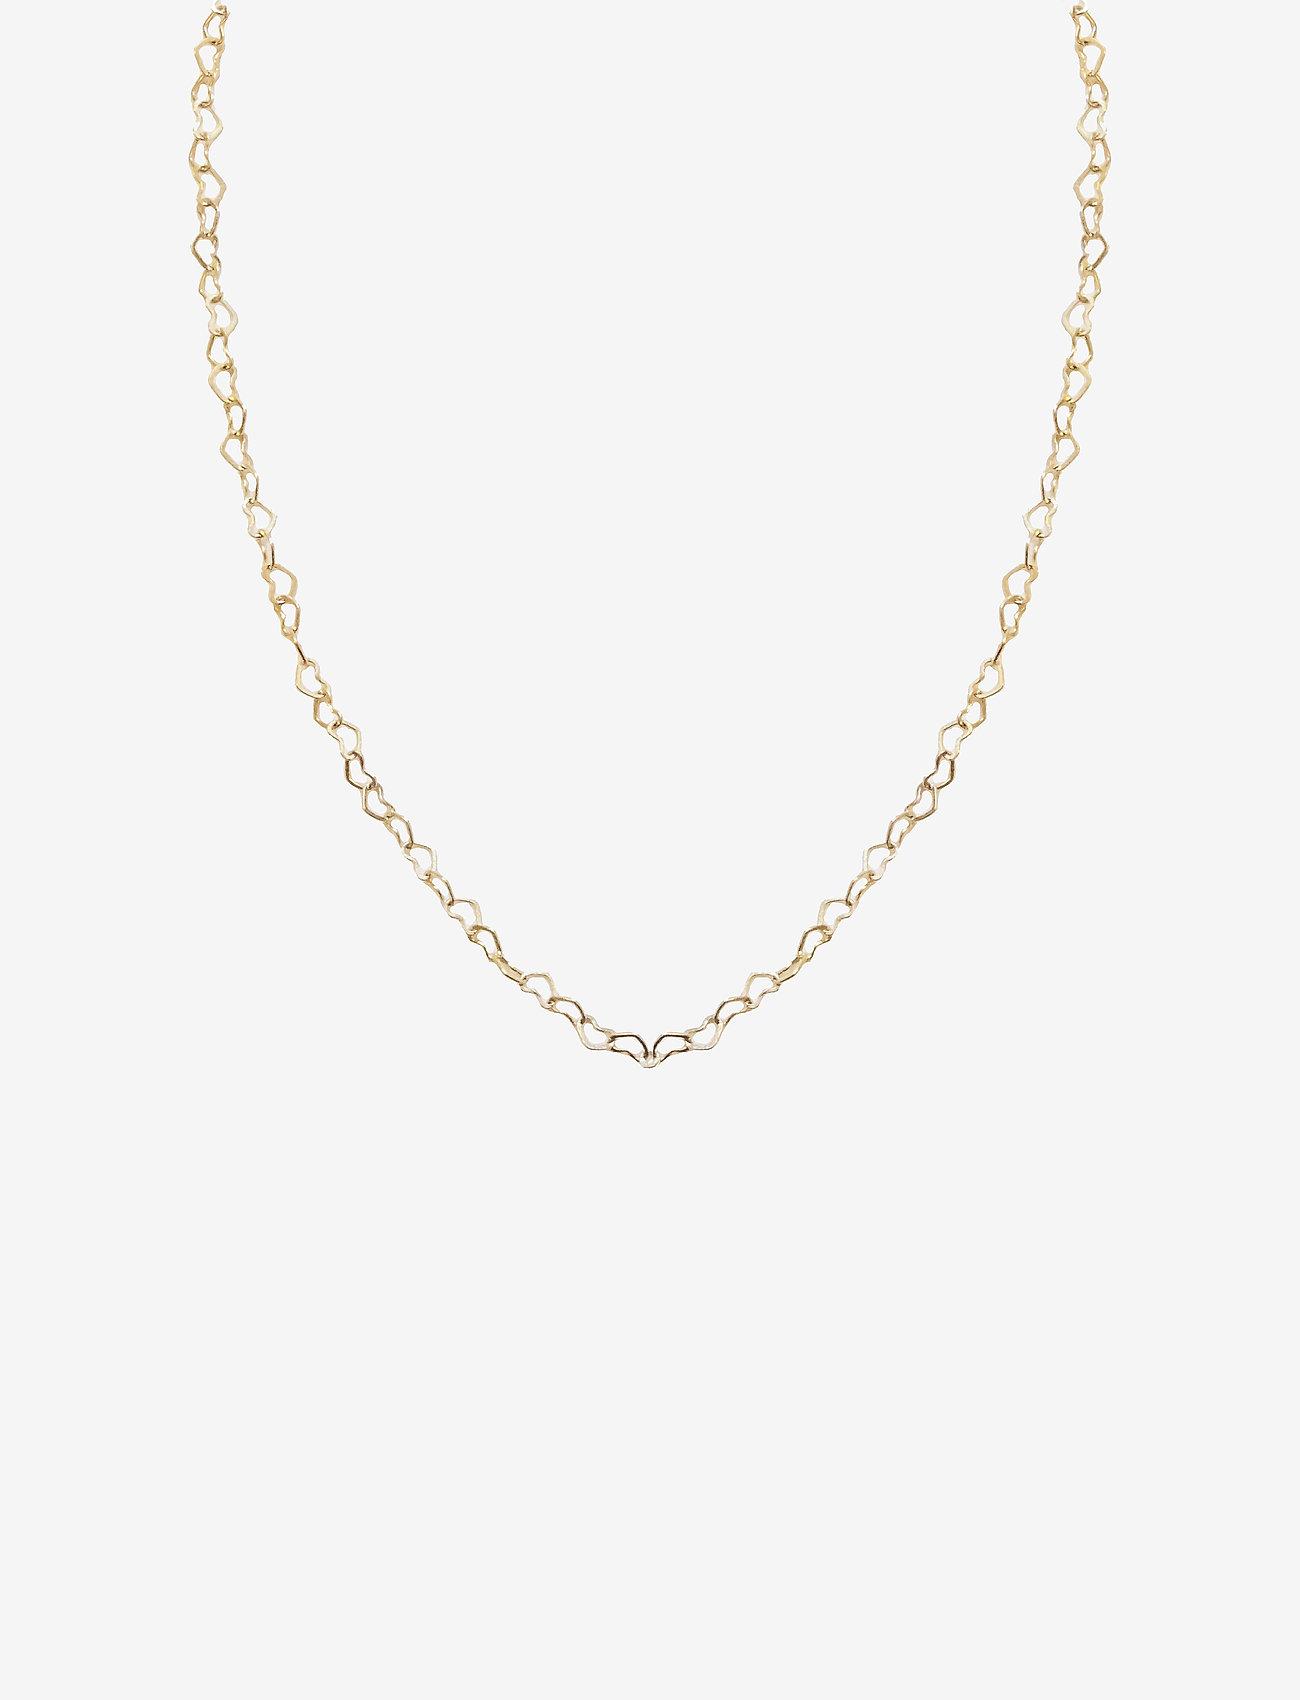 PIPOL'S BAZAAR Heart Chain Necklace Gold - Biżuteria GOLD - Akcesoria